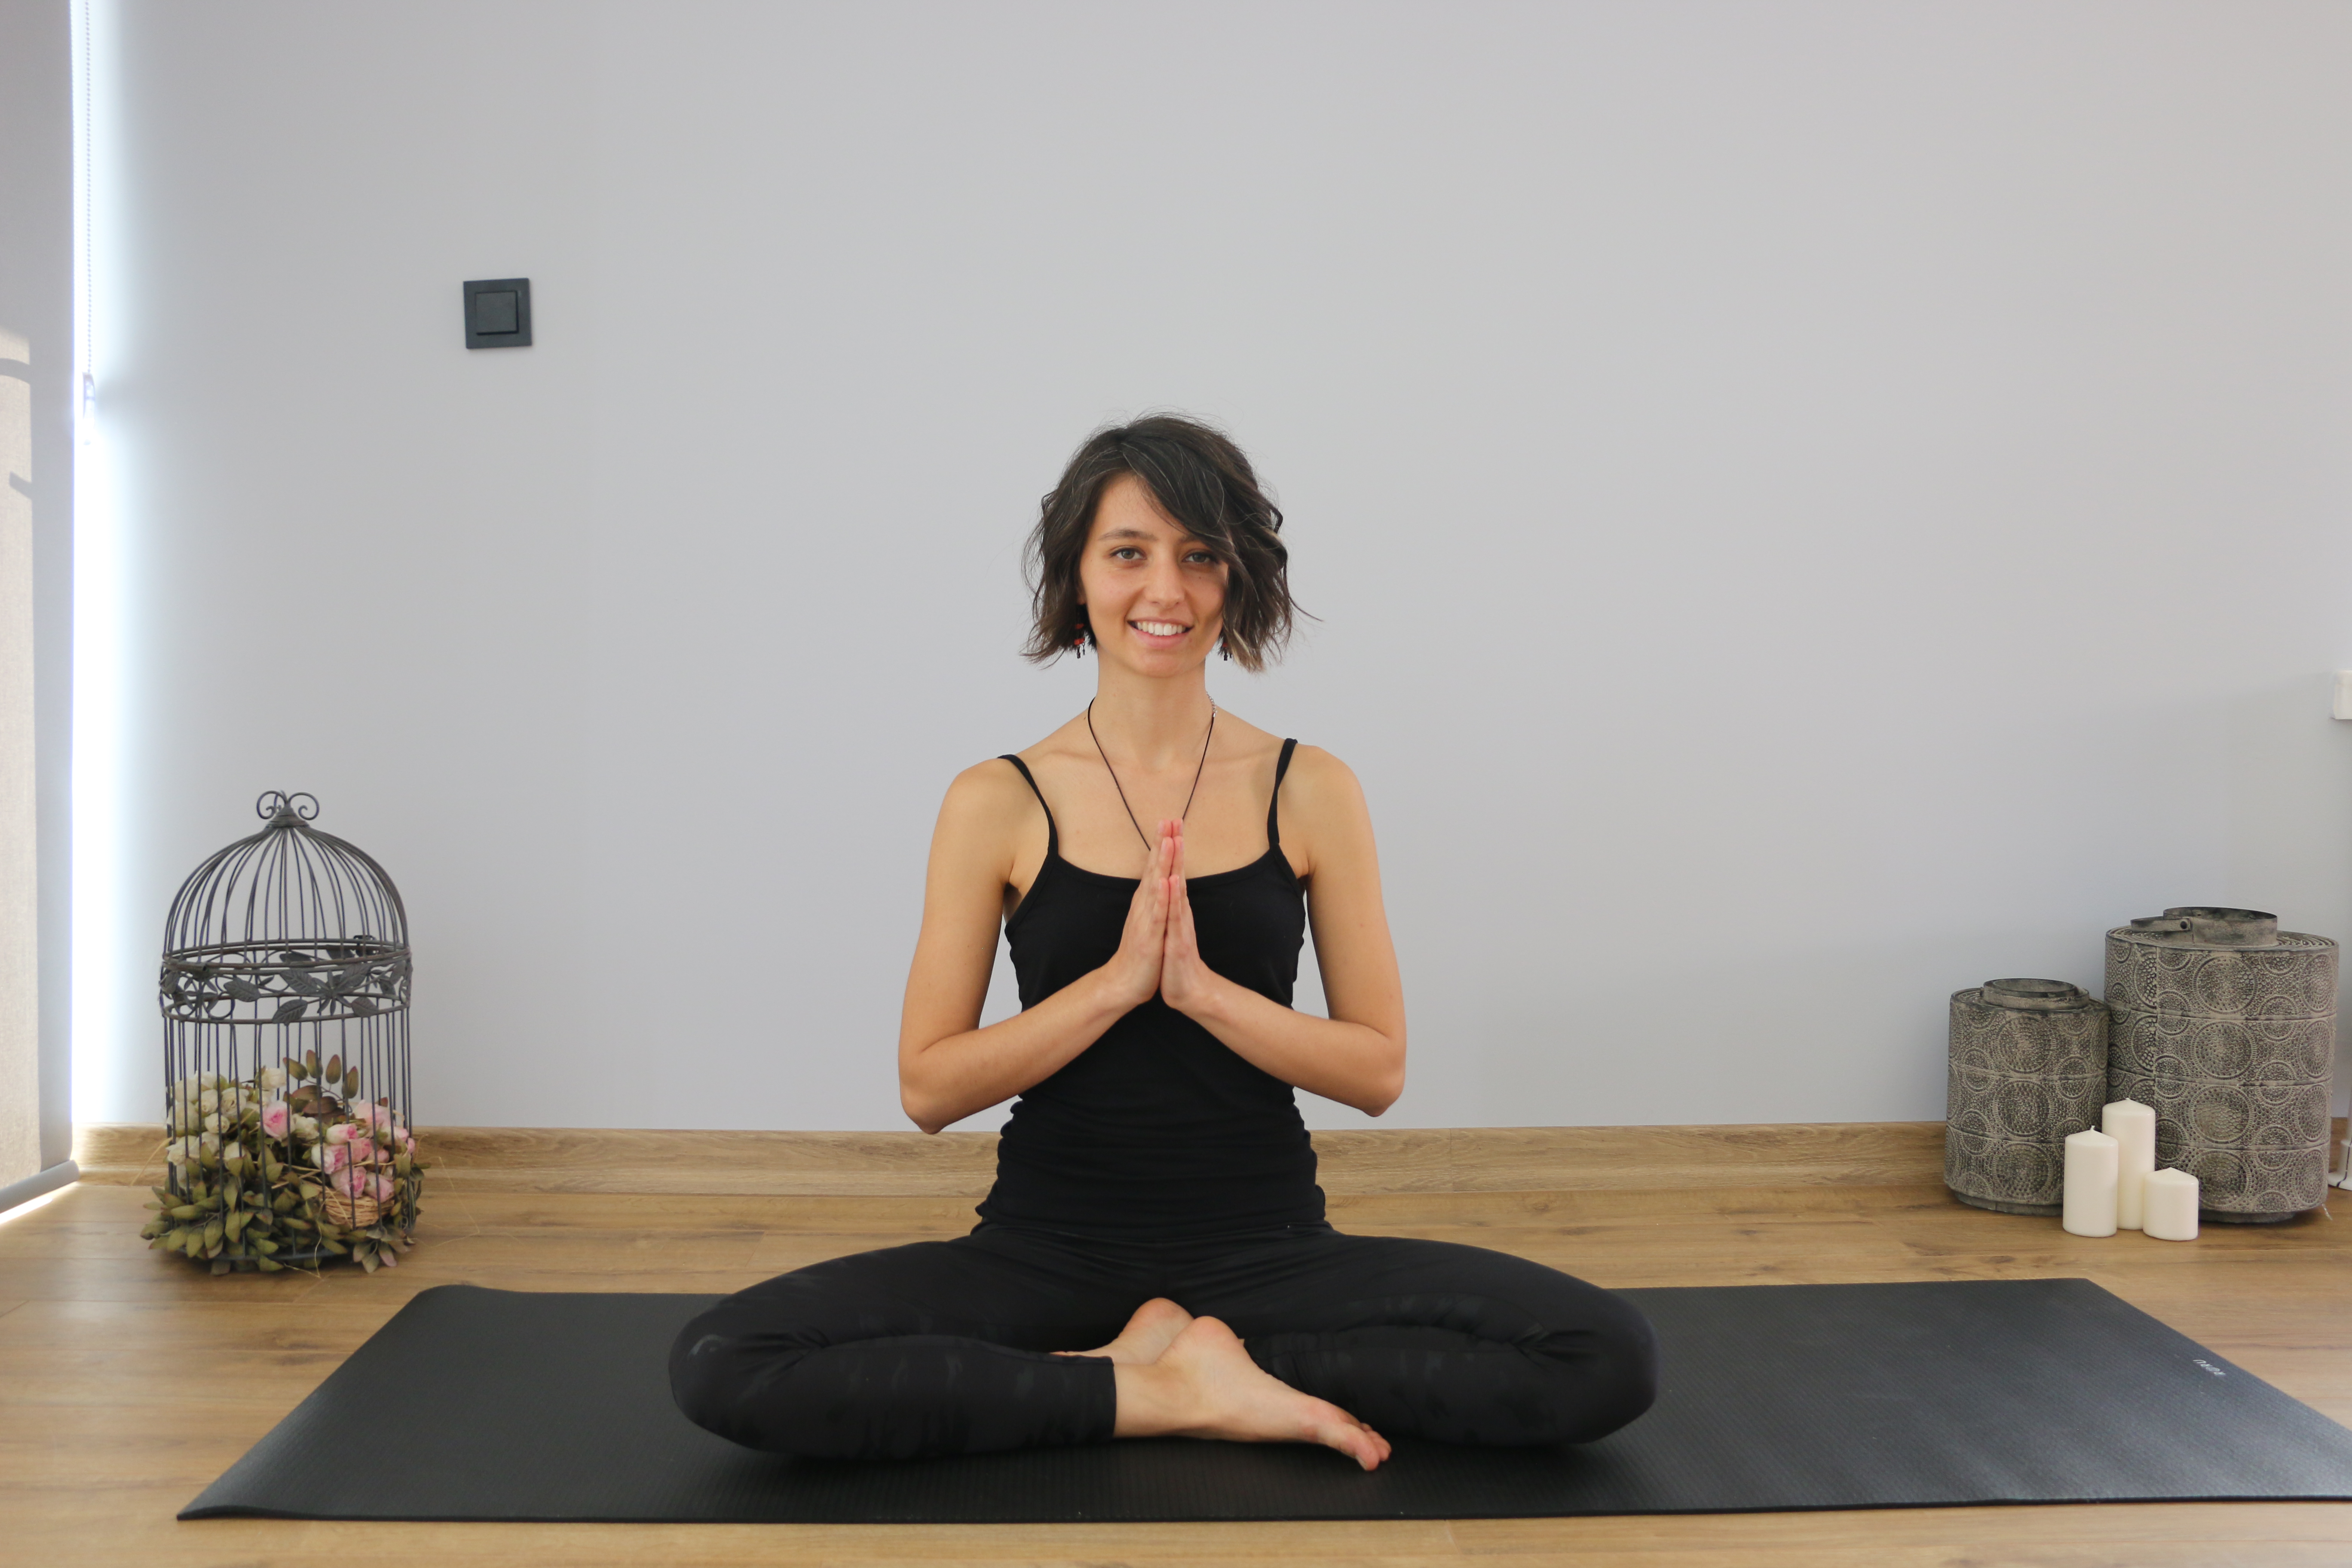 yoga yapan siyah giysili kadın